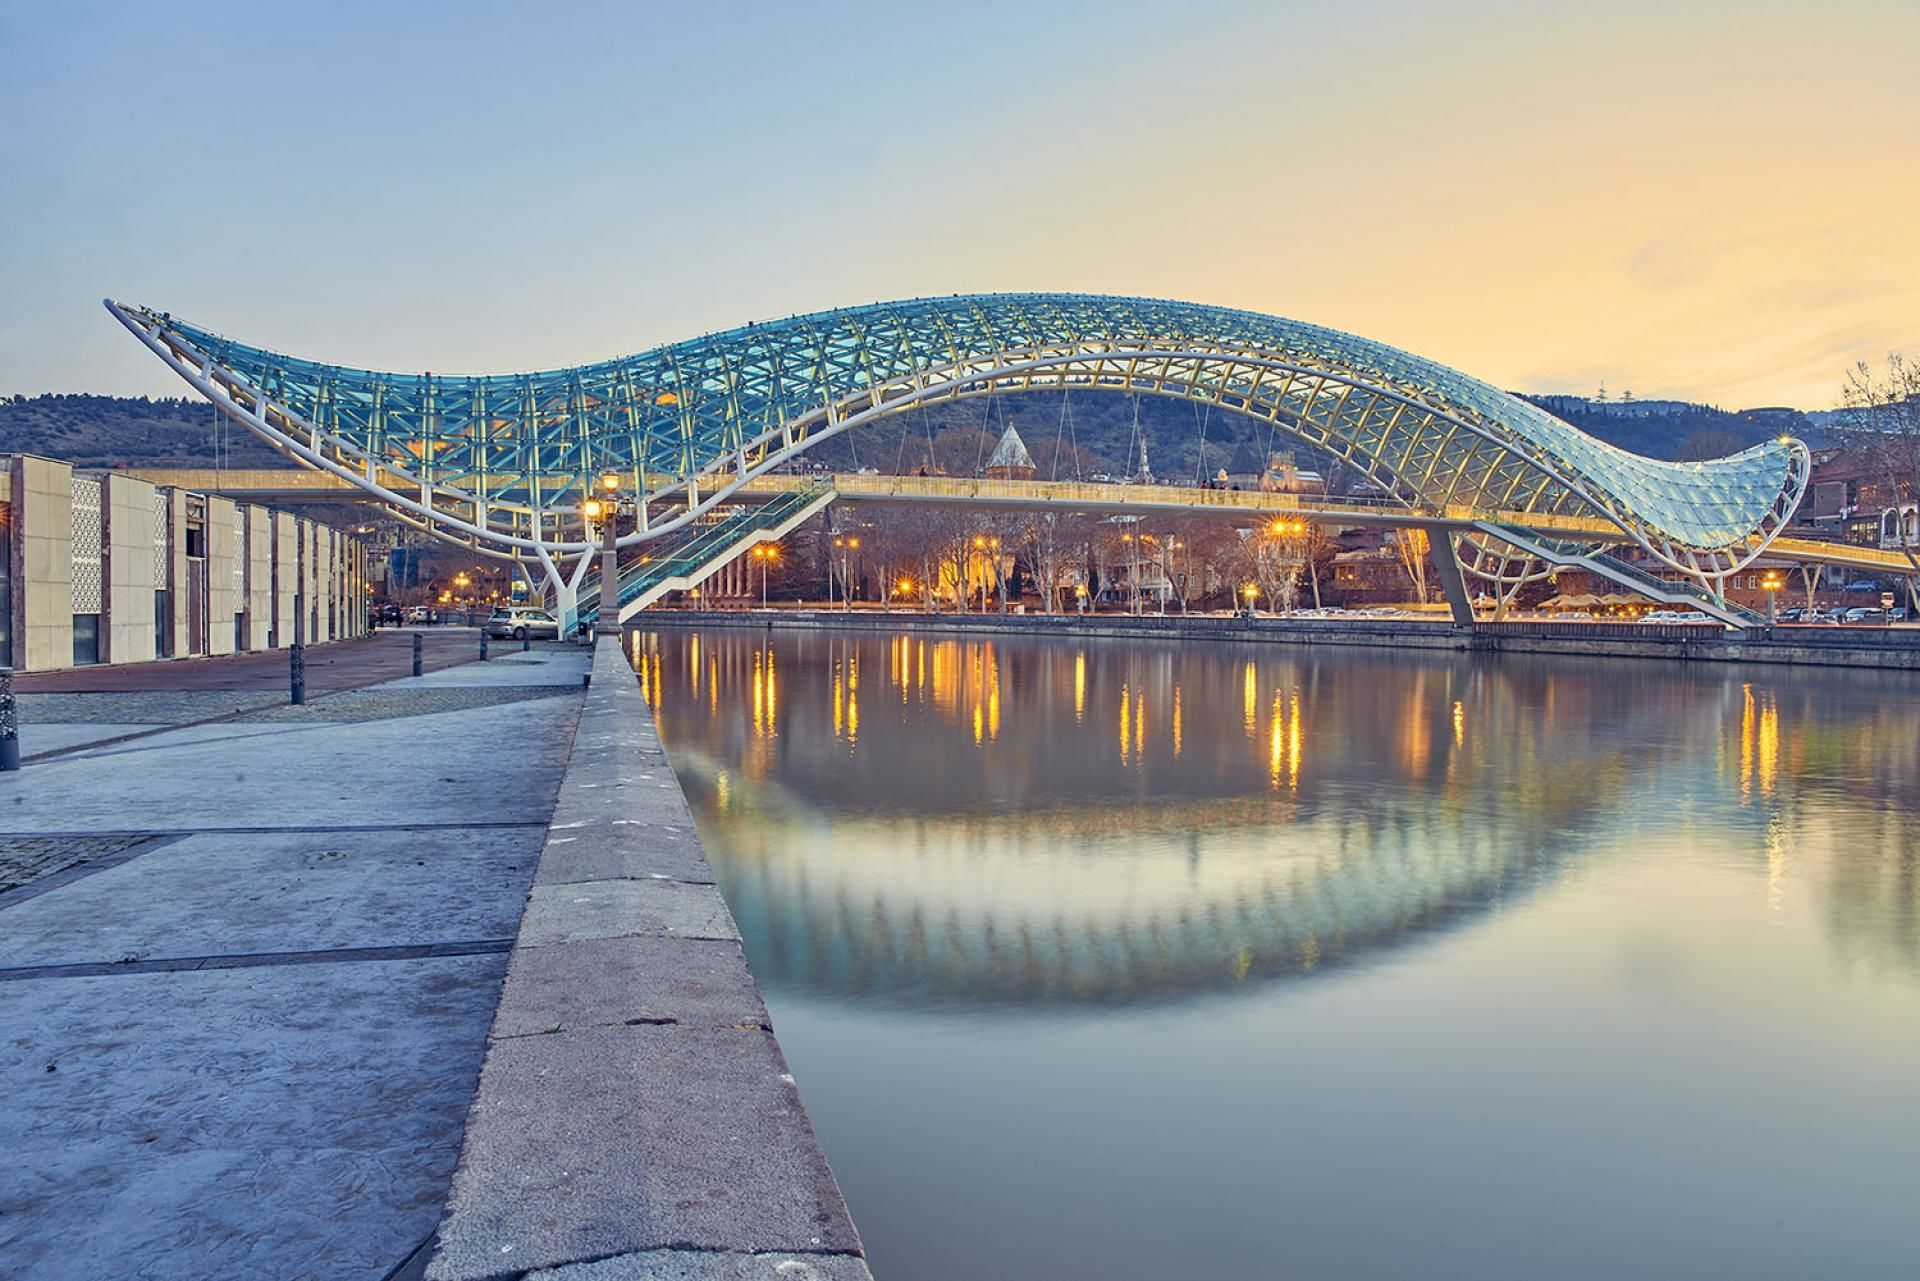 Тбилиси, мост Мира, Грузия